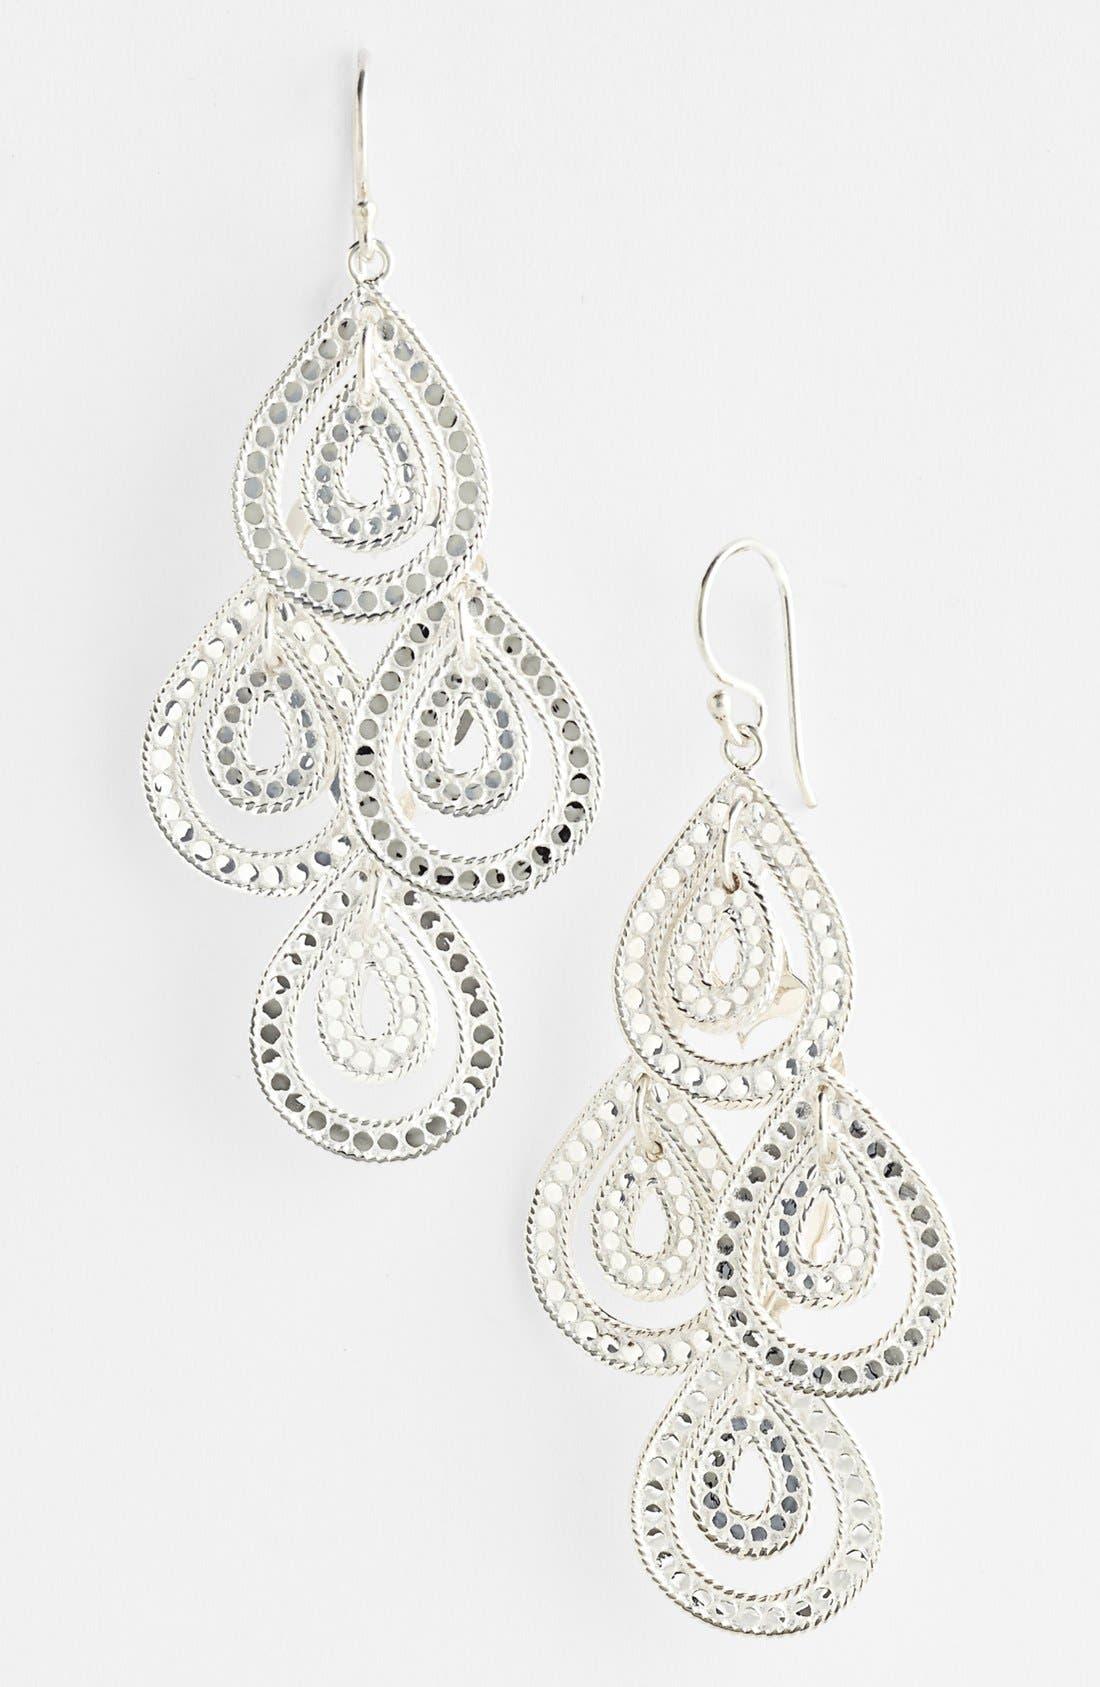 Alternate Image 1 Selected - Anna Beck 'Sulawesi' Double Teardrop Chandelier Earrings